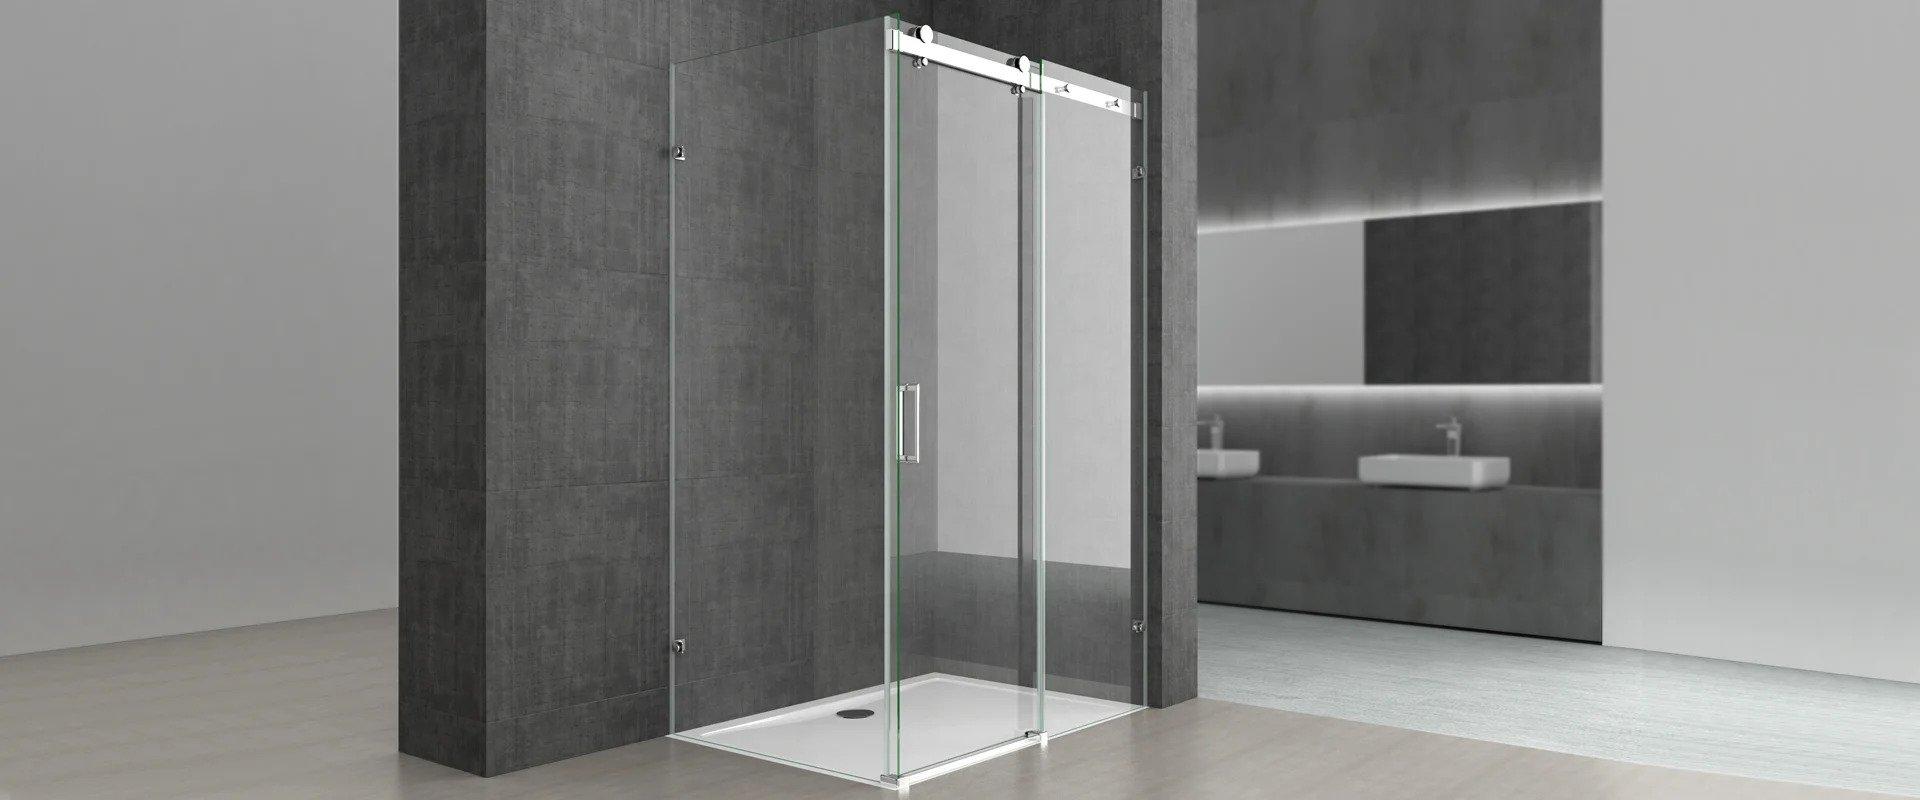 The Uk Bathroom Specialist Durovin Bathrooms Uk